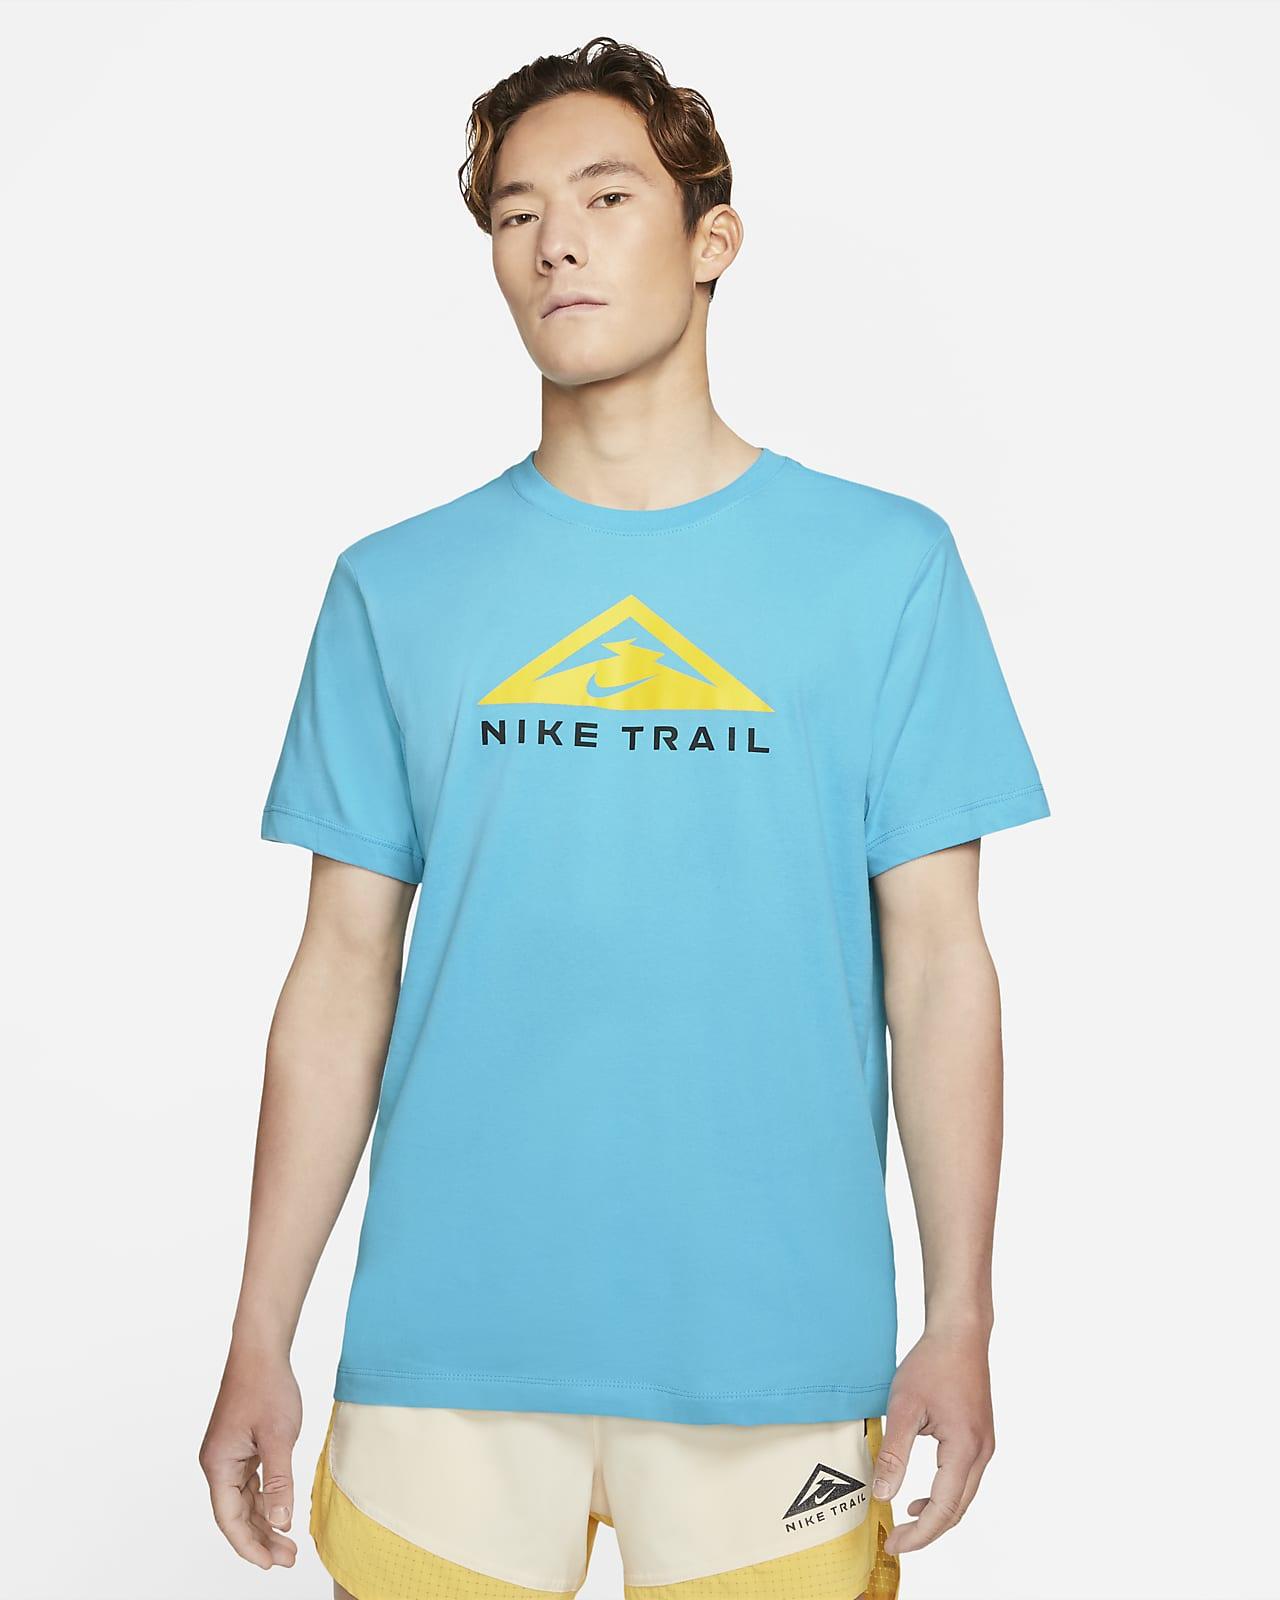 Nike Dri-FIT Short-Sleeve Trail Running T-Shirt